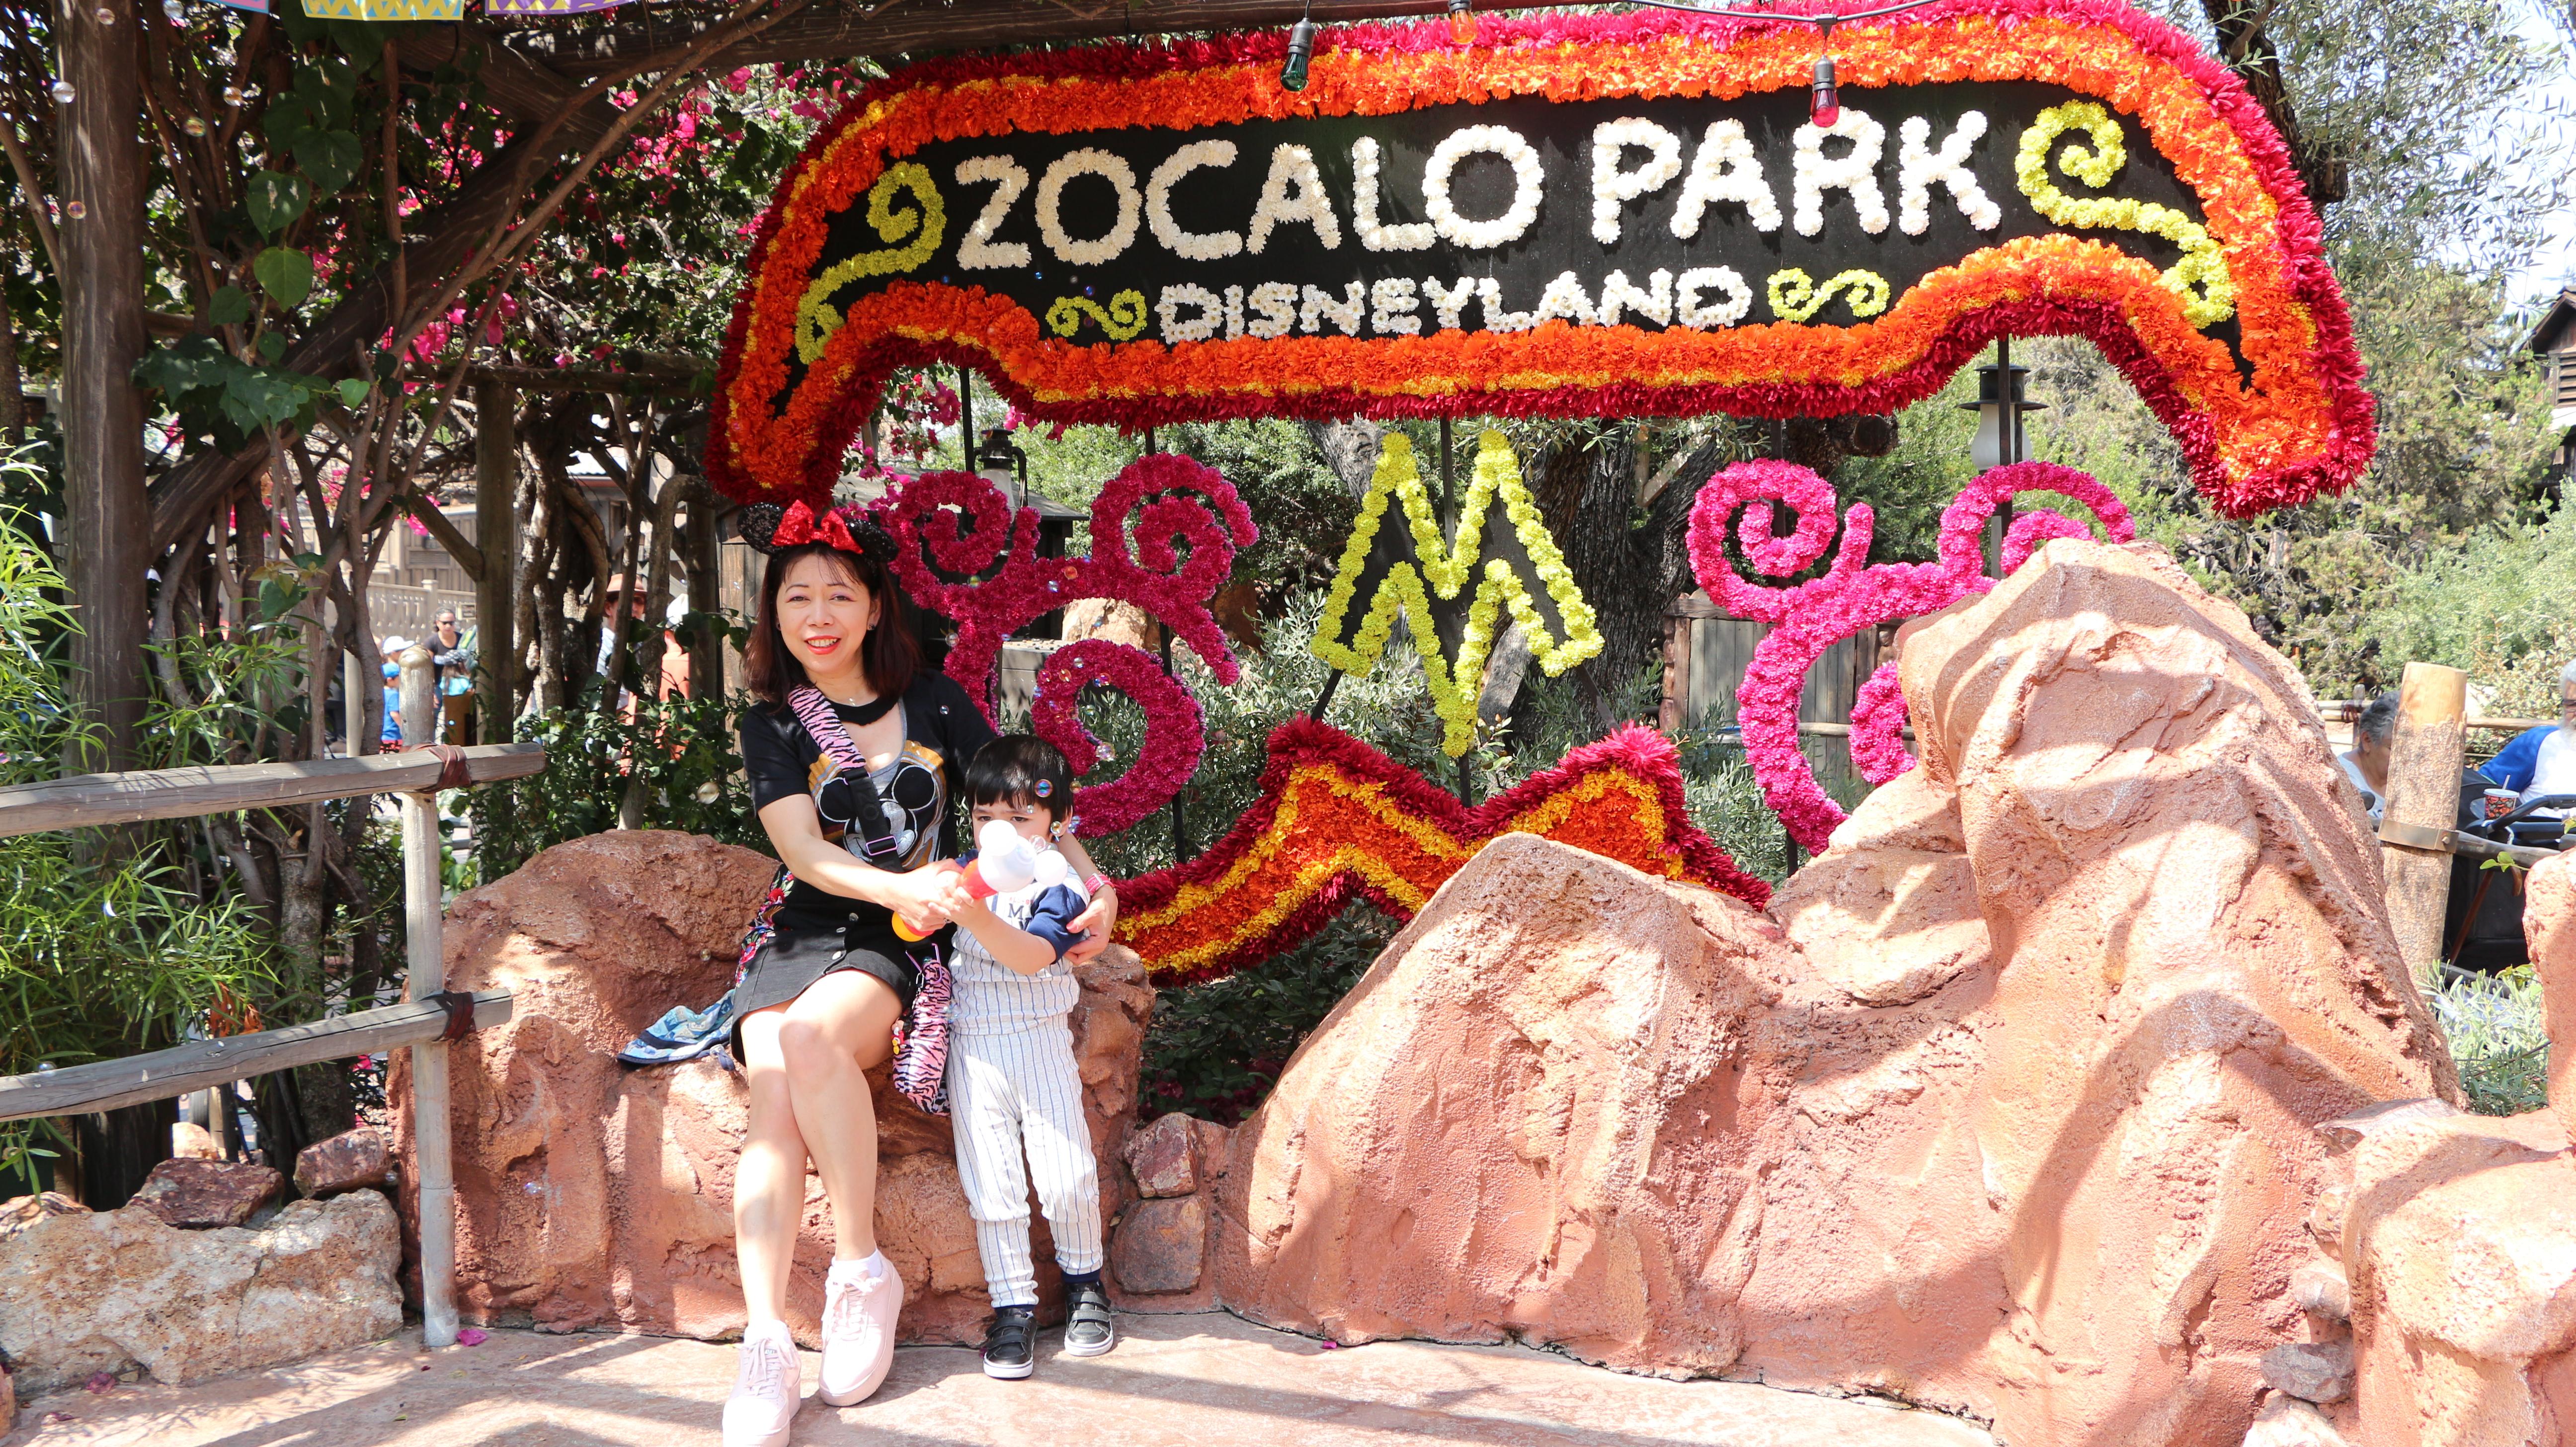 Zocalo Park Disneyland